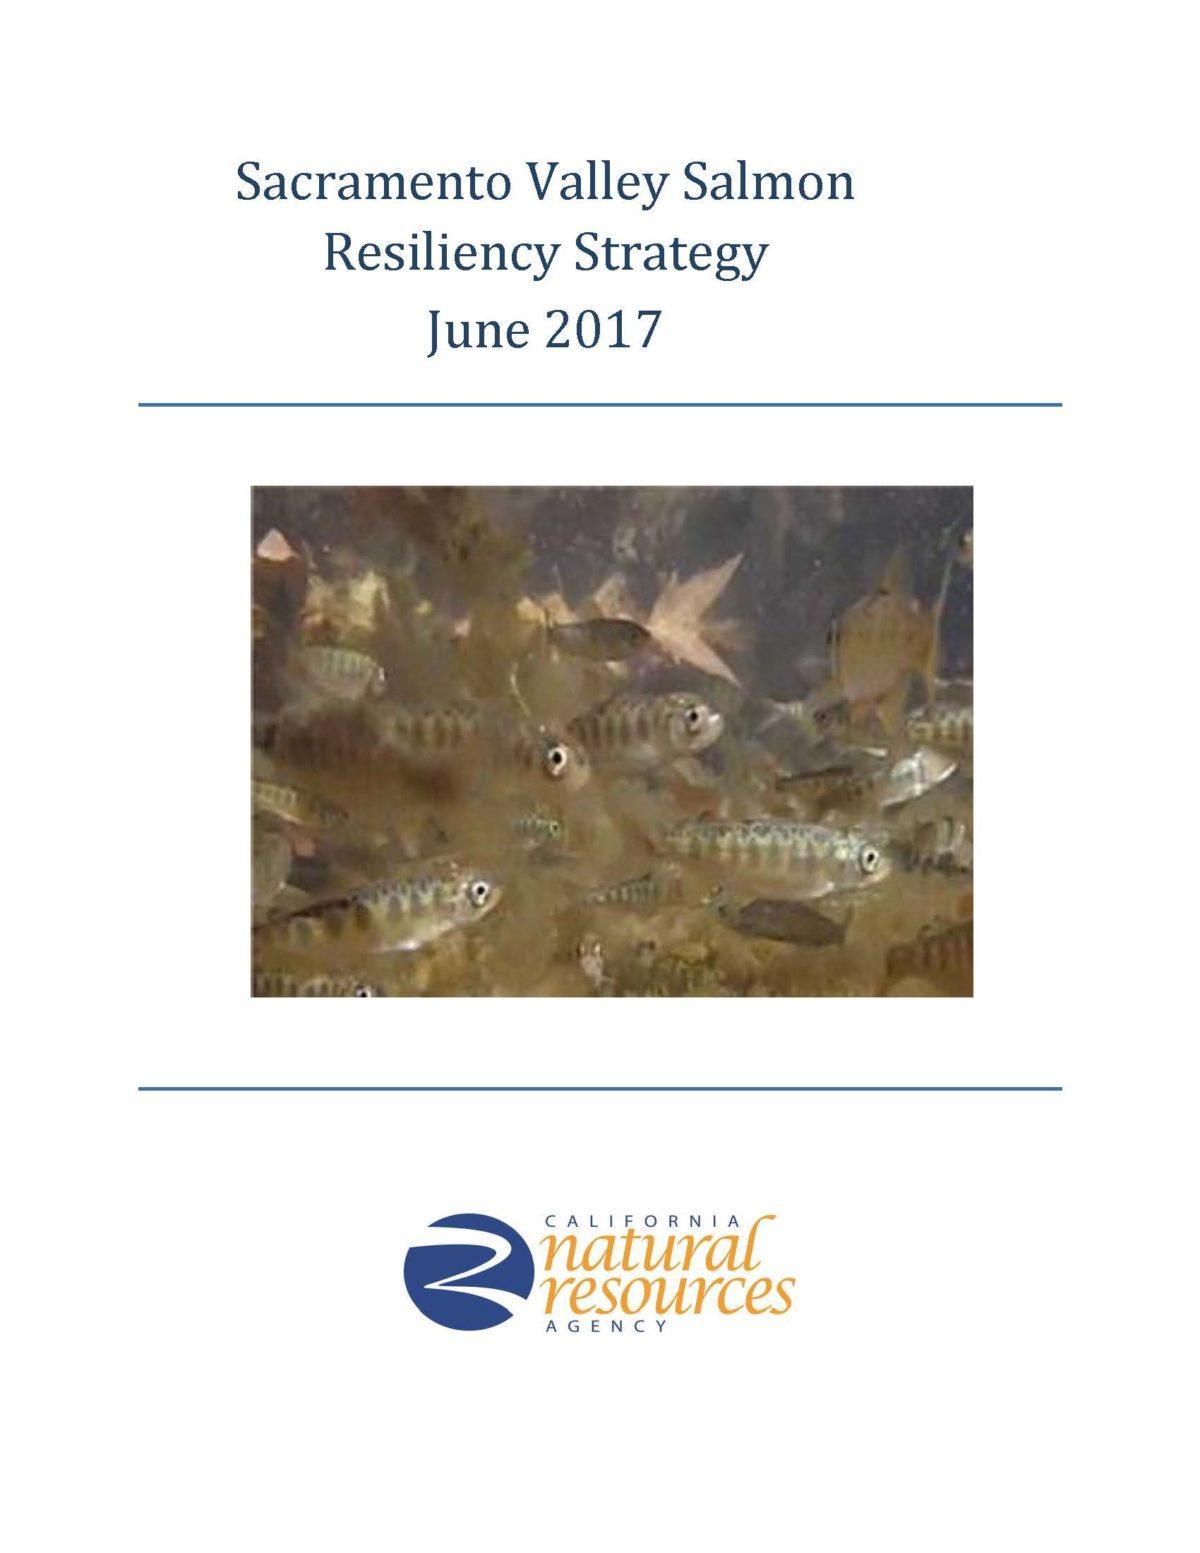 Sacramento Valley Salmon Resiliency Strategy June 2017